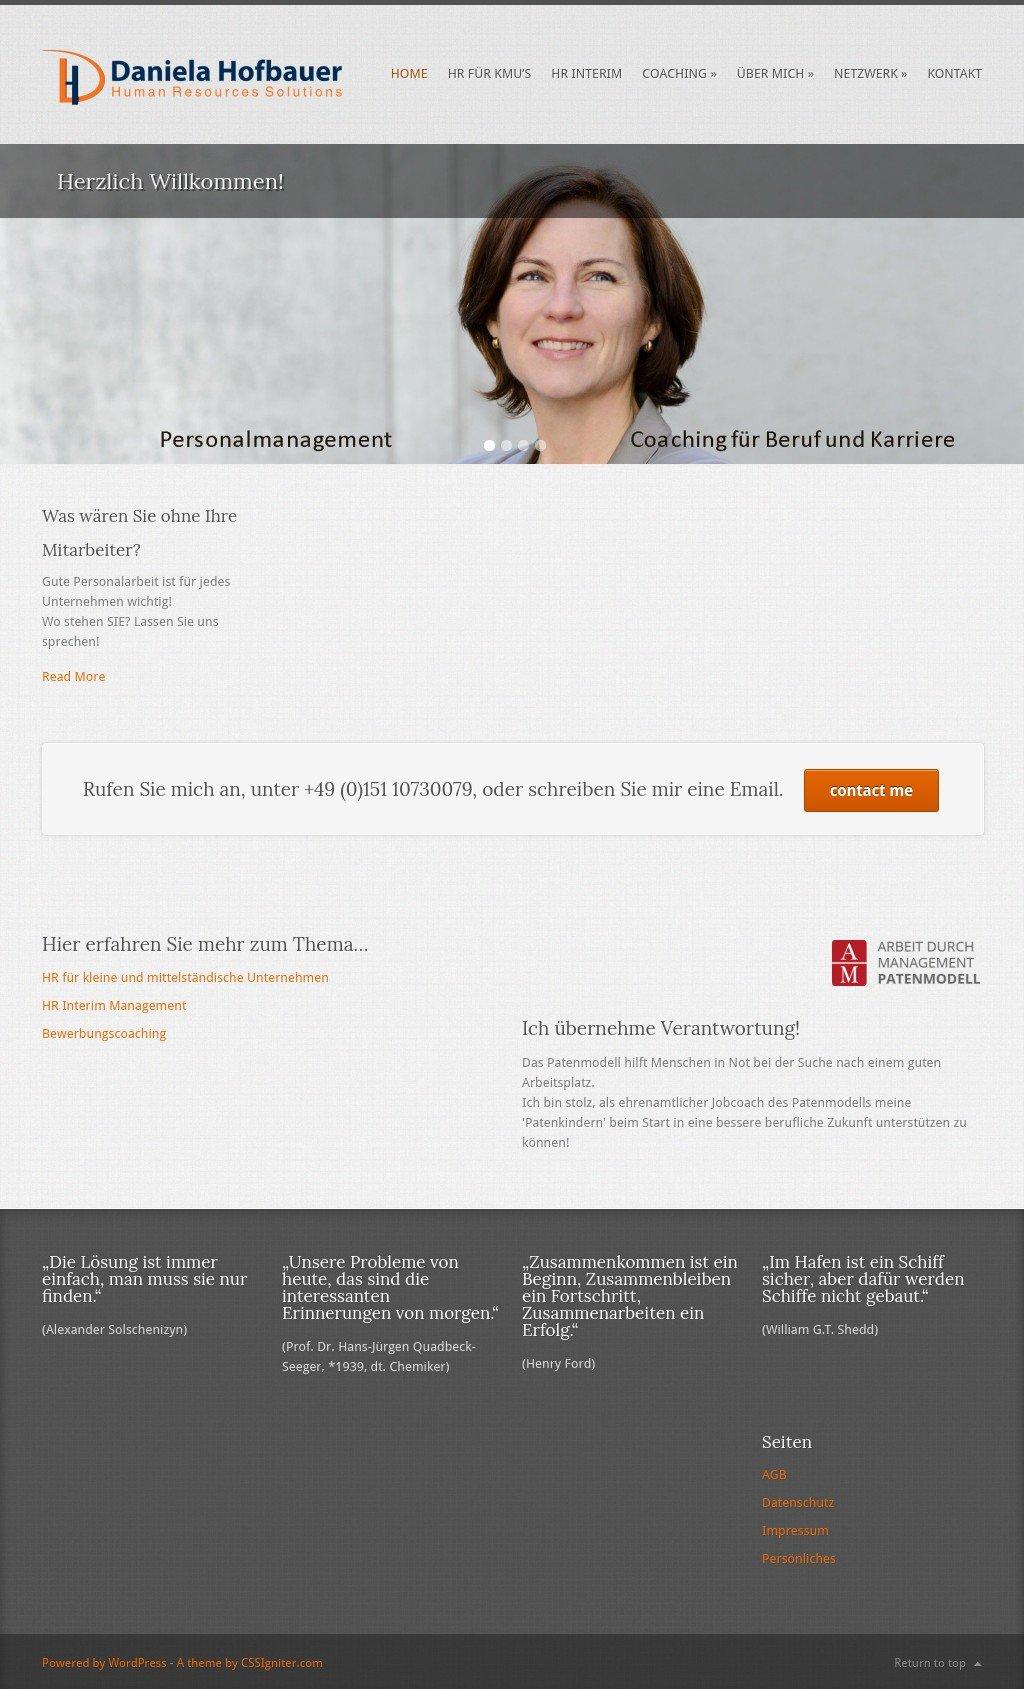 Daniela Hofbauer - Human Resources Solutions